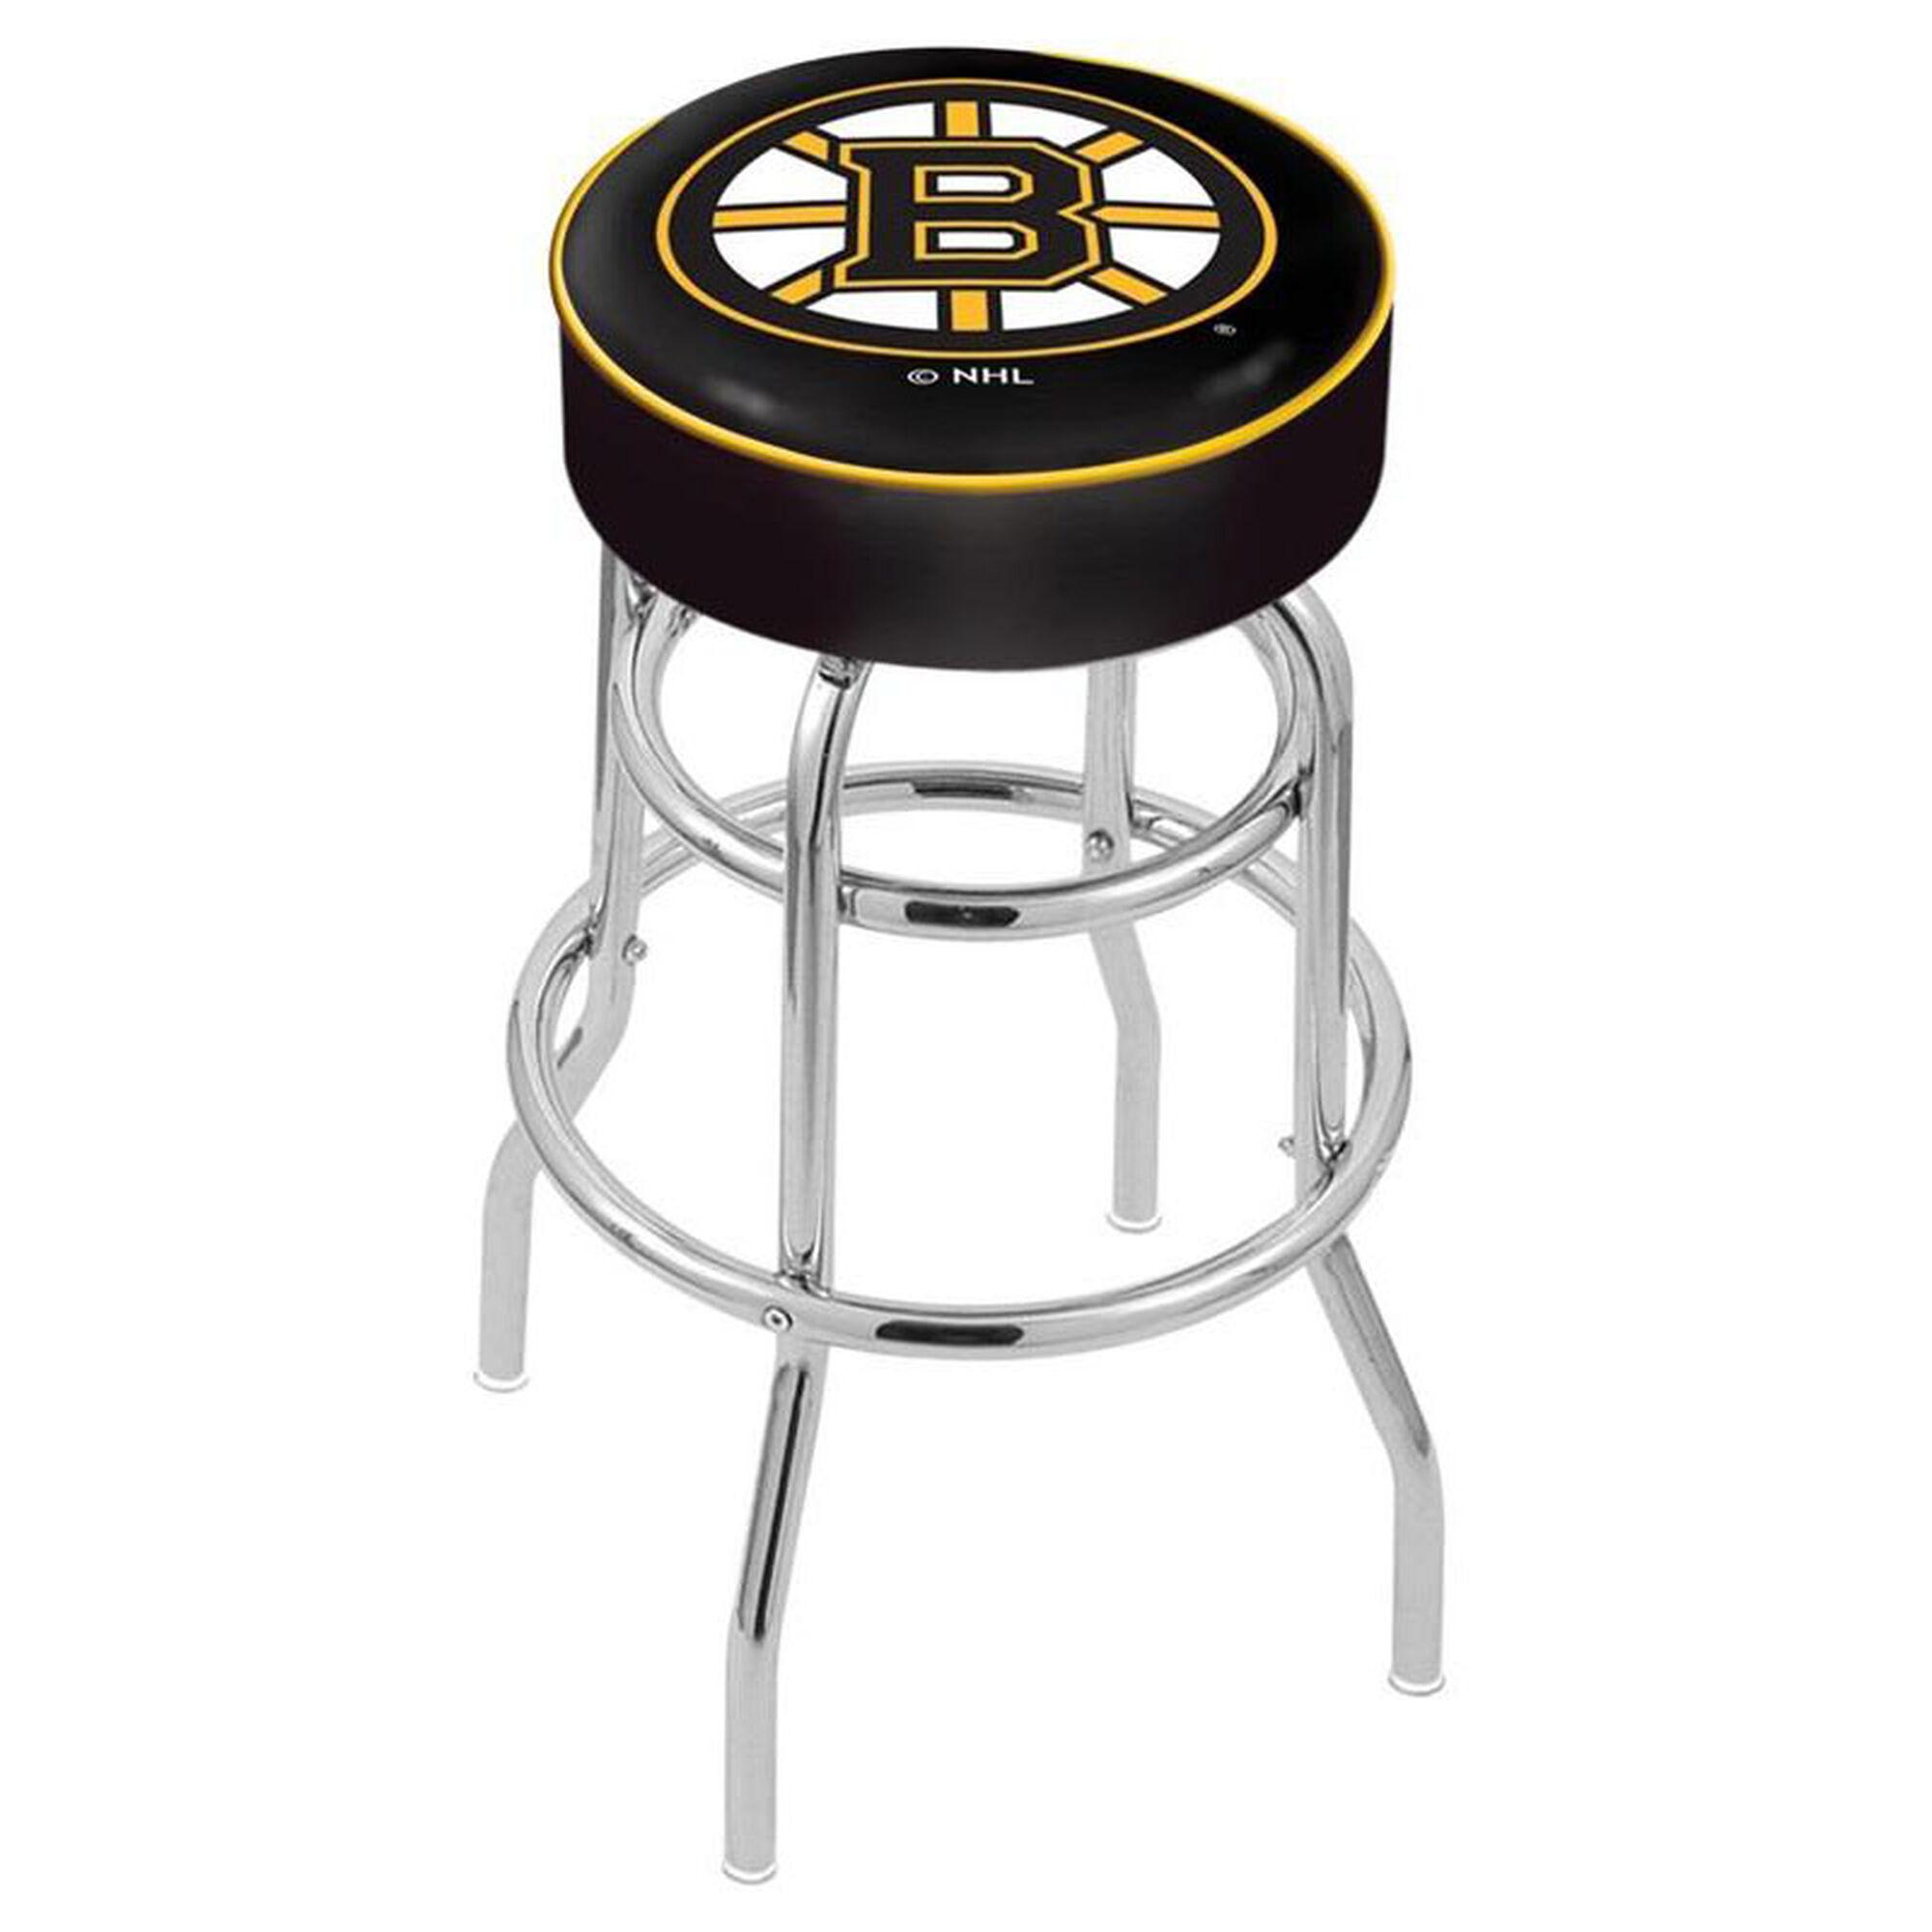 The Holland Bar Stool Co Boston Bruins 25 Chrome Finish